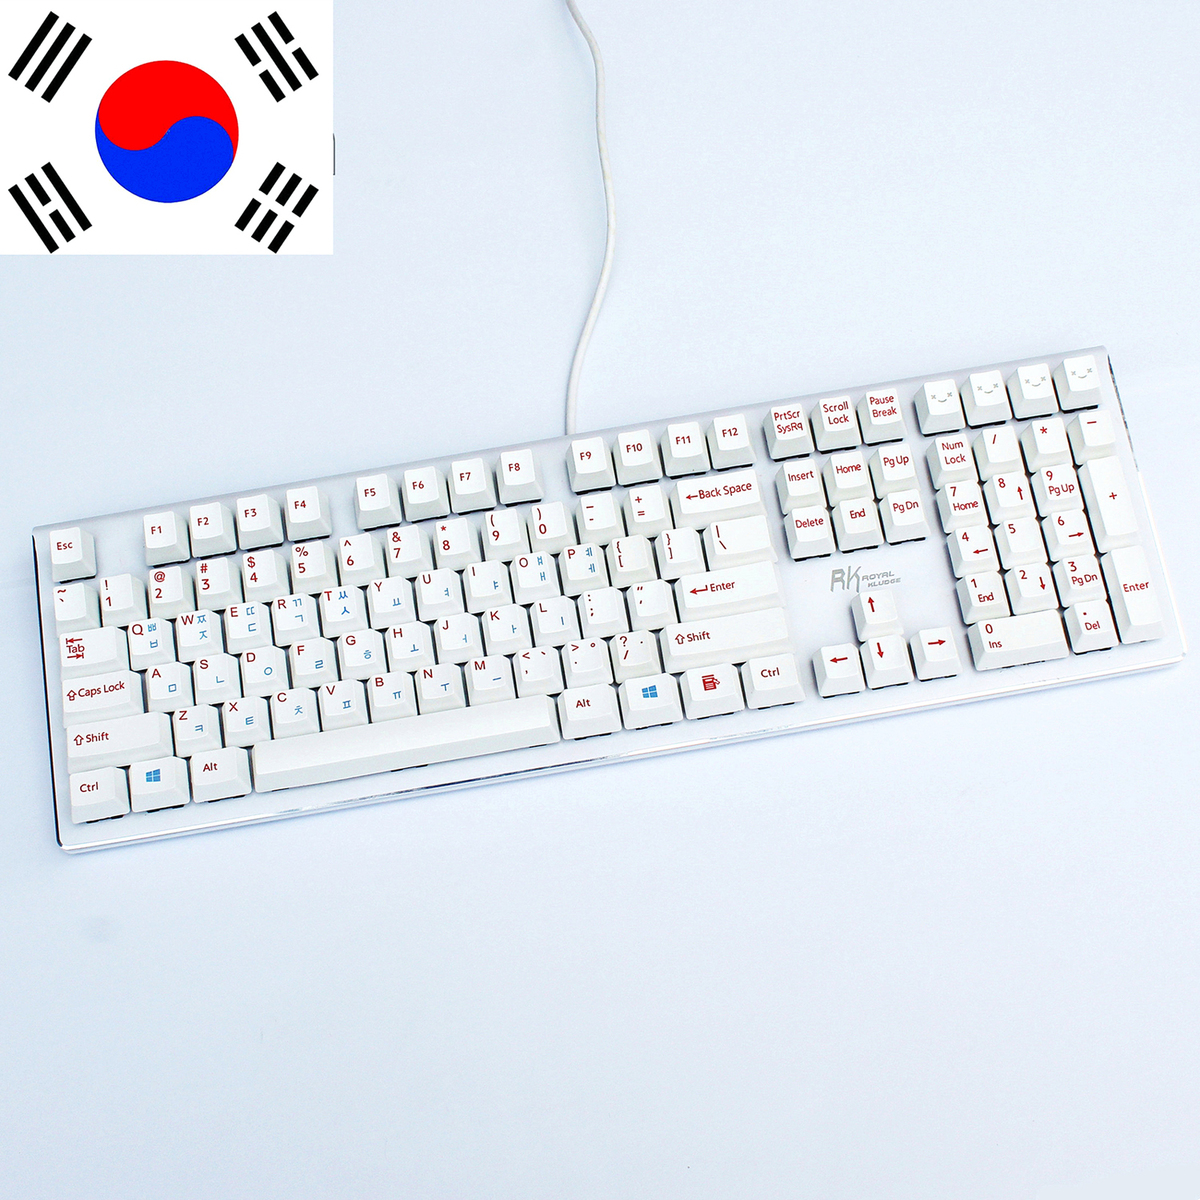 108 Pcs/set Mechanical Keyboard Korean Key Caps Dye-Sublimation Wear-resisting OEM PBT Thicken Key Cap ANSI Layout No Oil